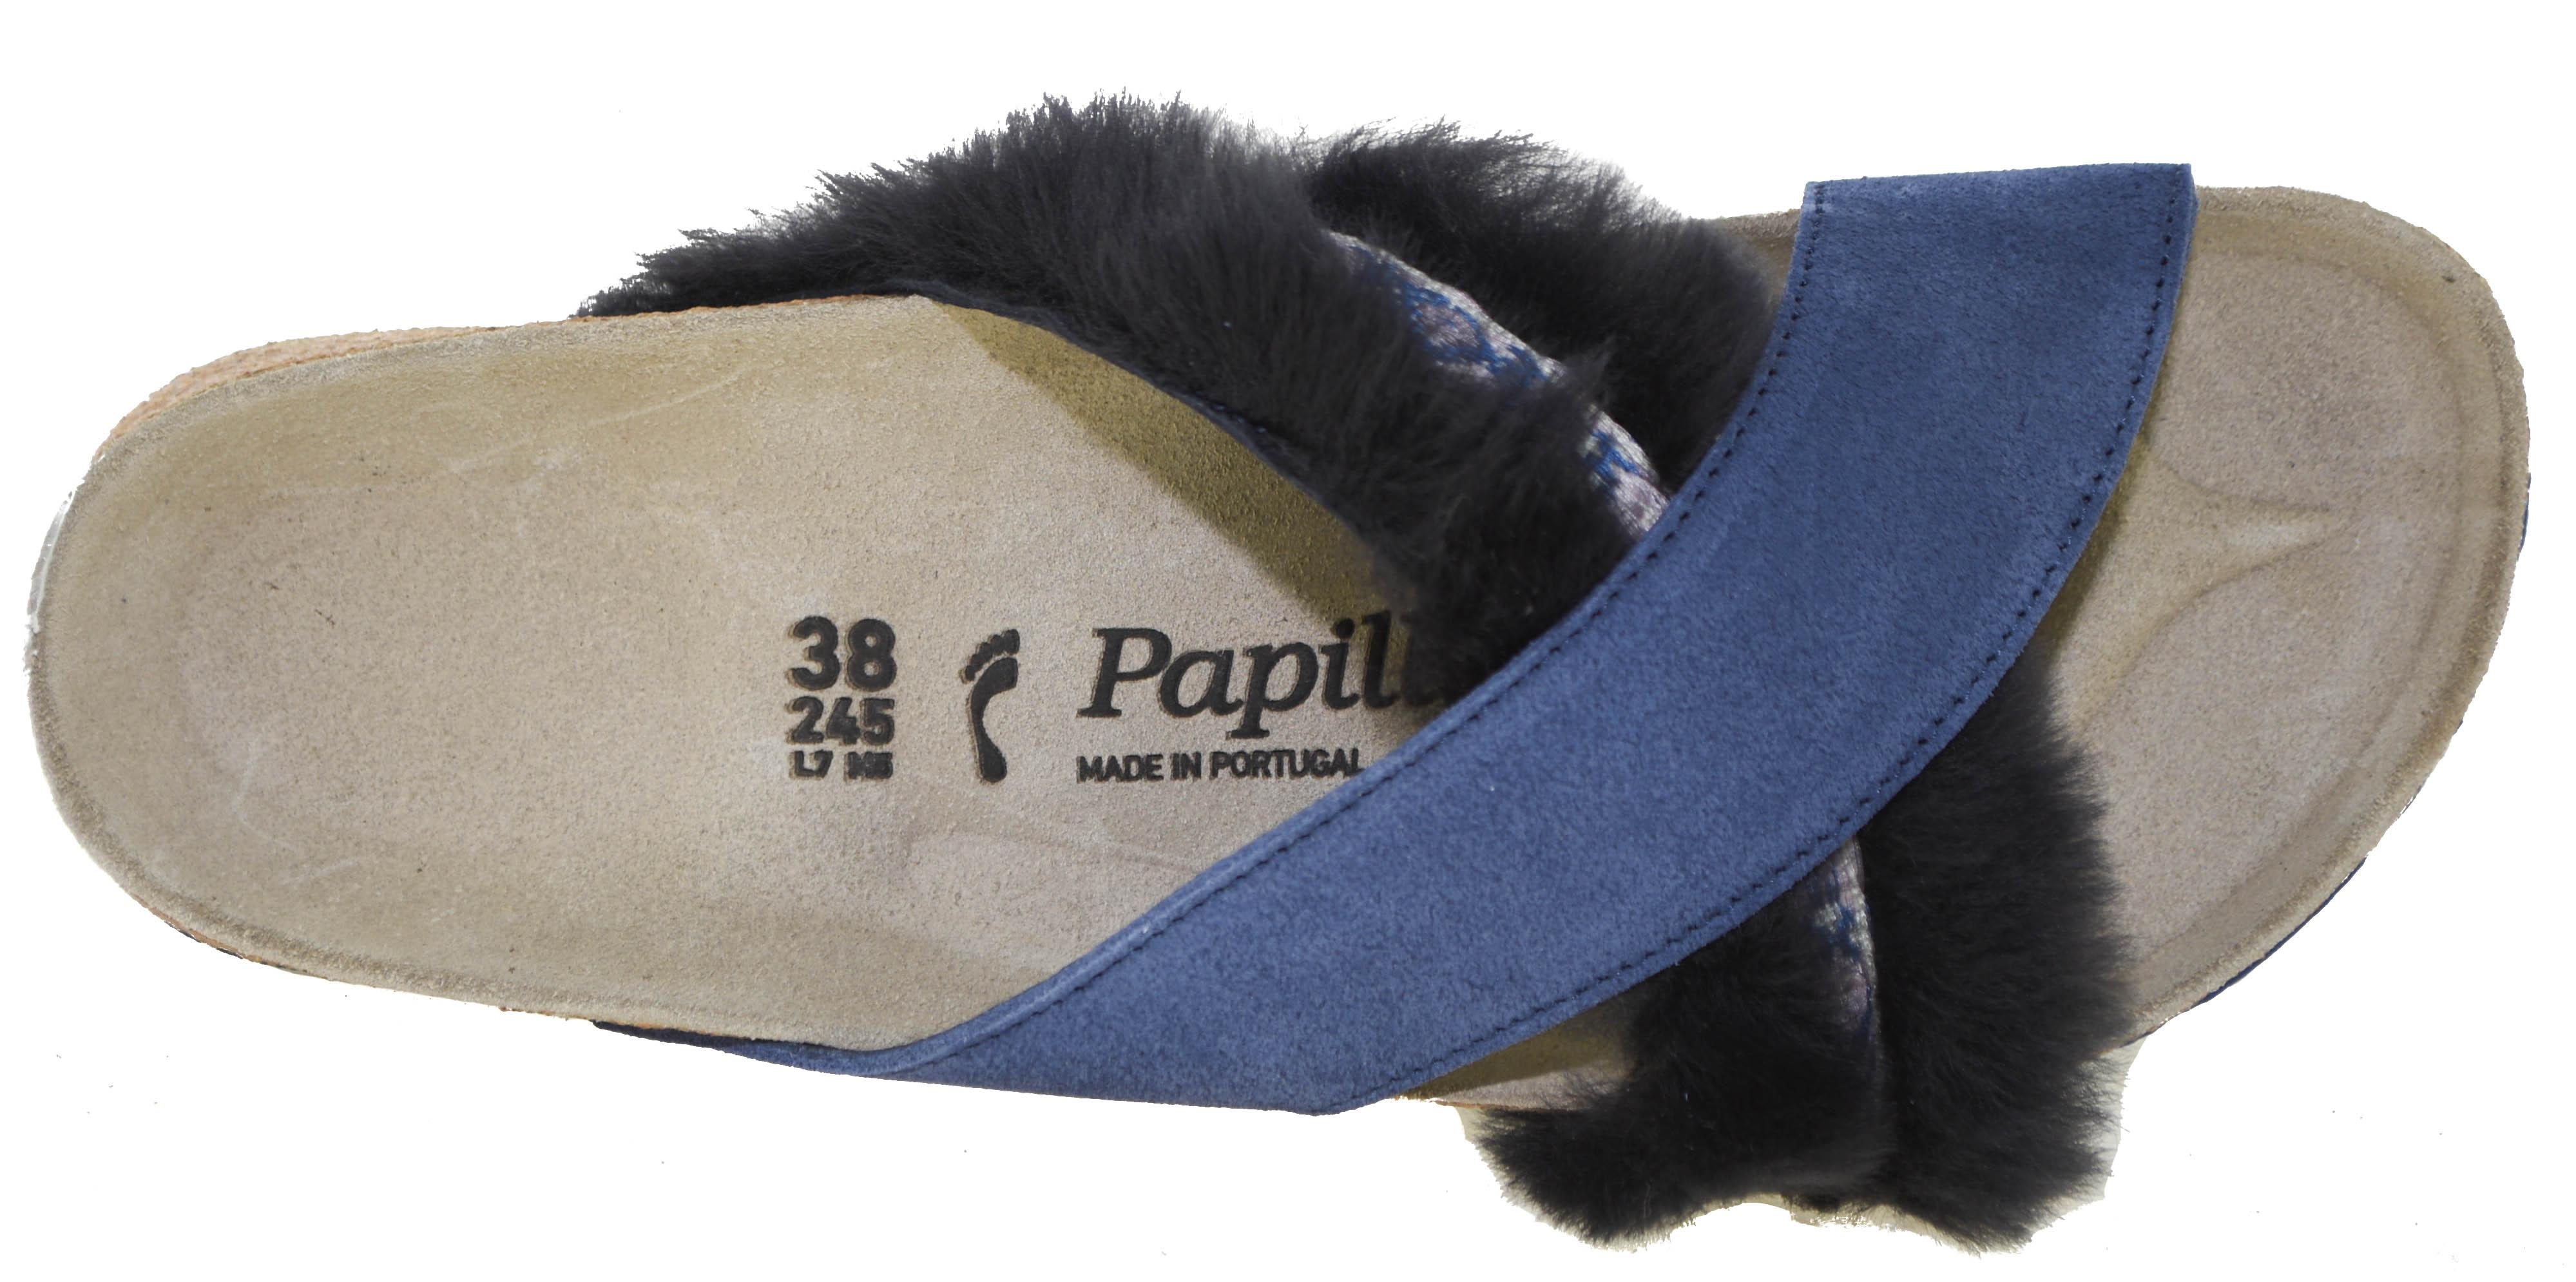 470267c8ea83 Birkenstock Papillio Women s Daytona Sandals Cozy Night Blue Style 1007288  EU 38